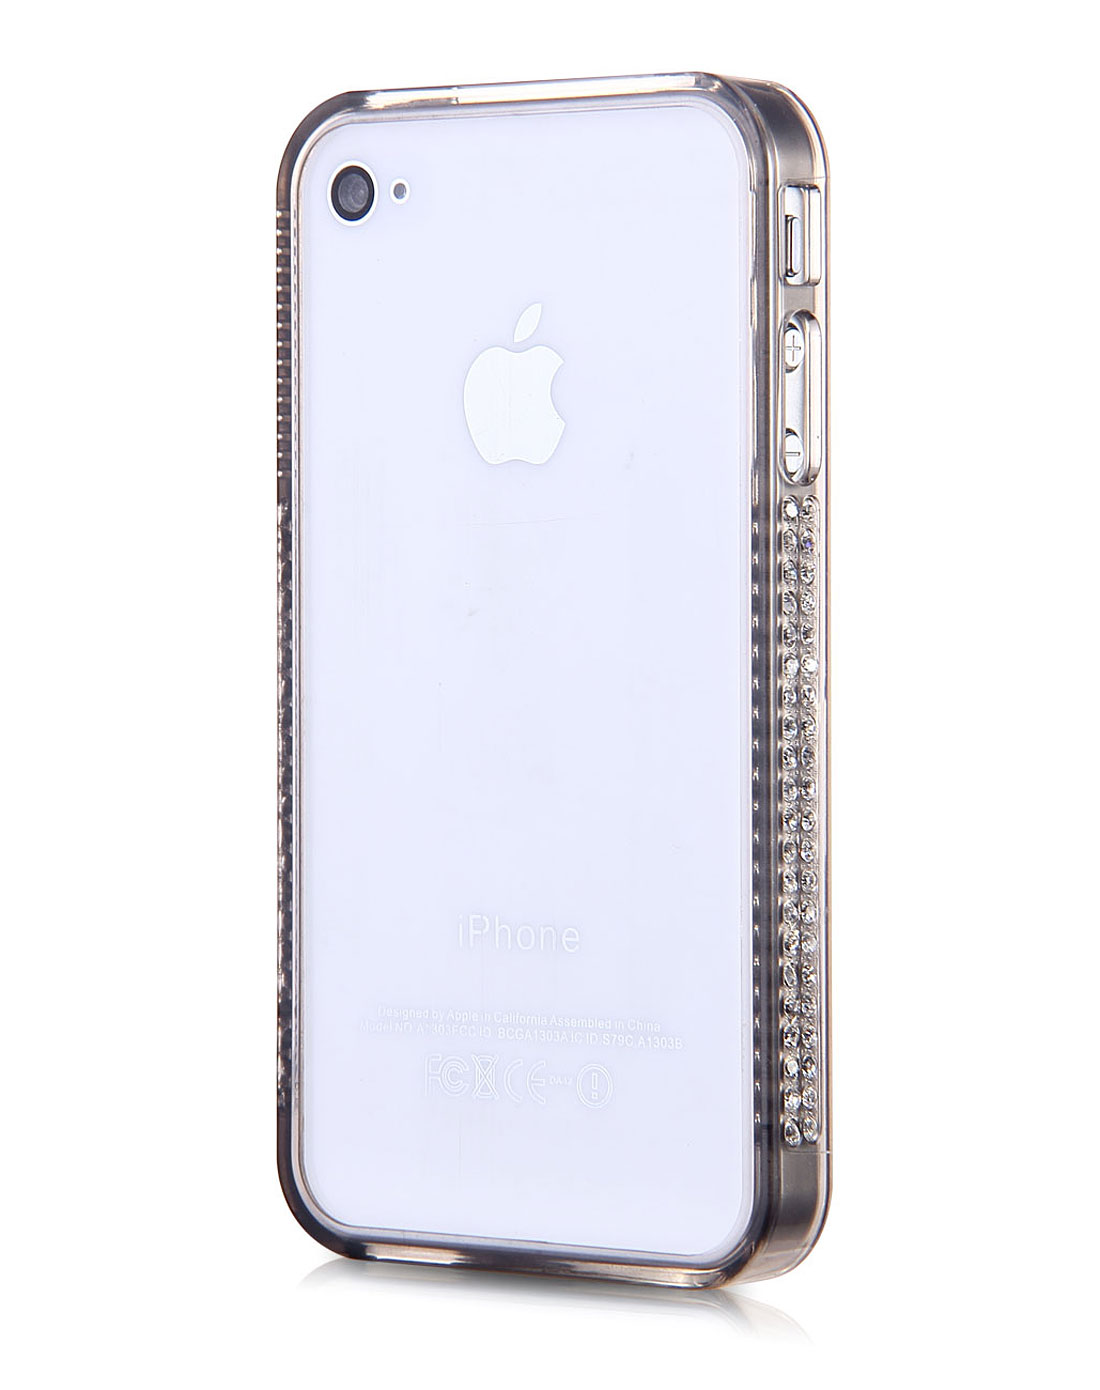 iphone 4/4s 黑色简易钻石边框手机保护壳